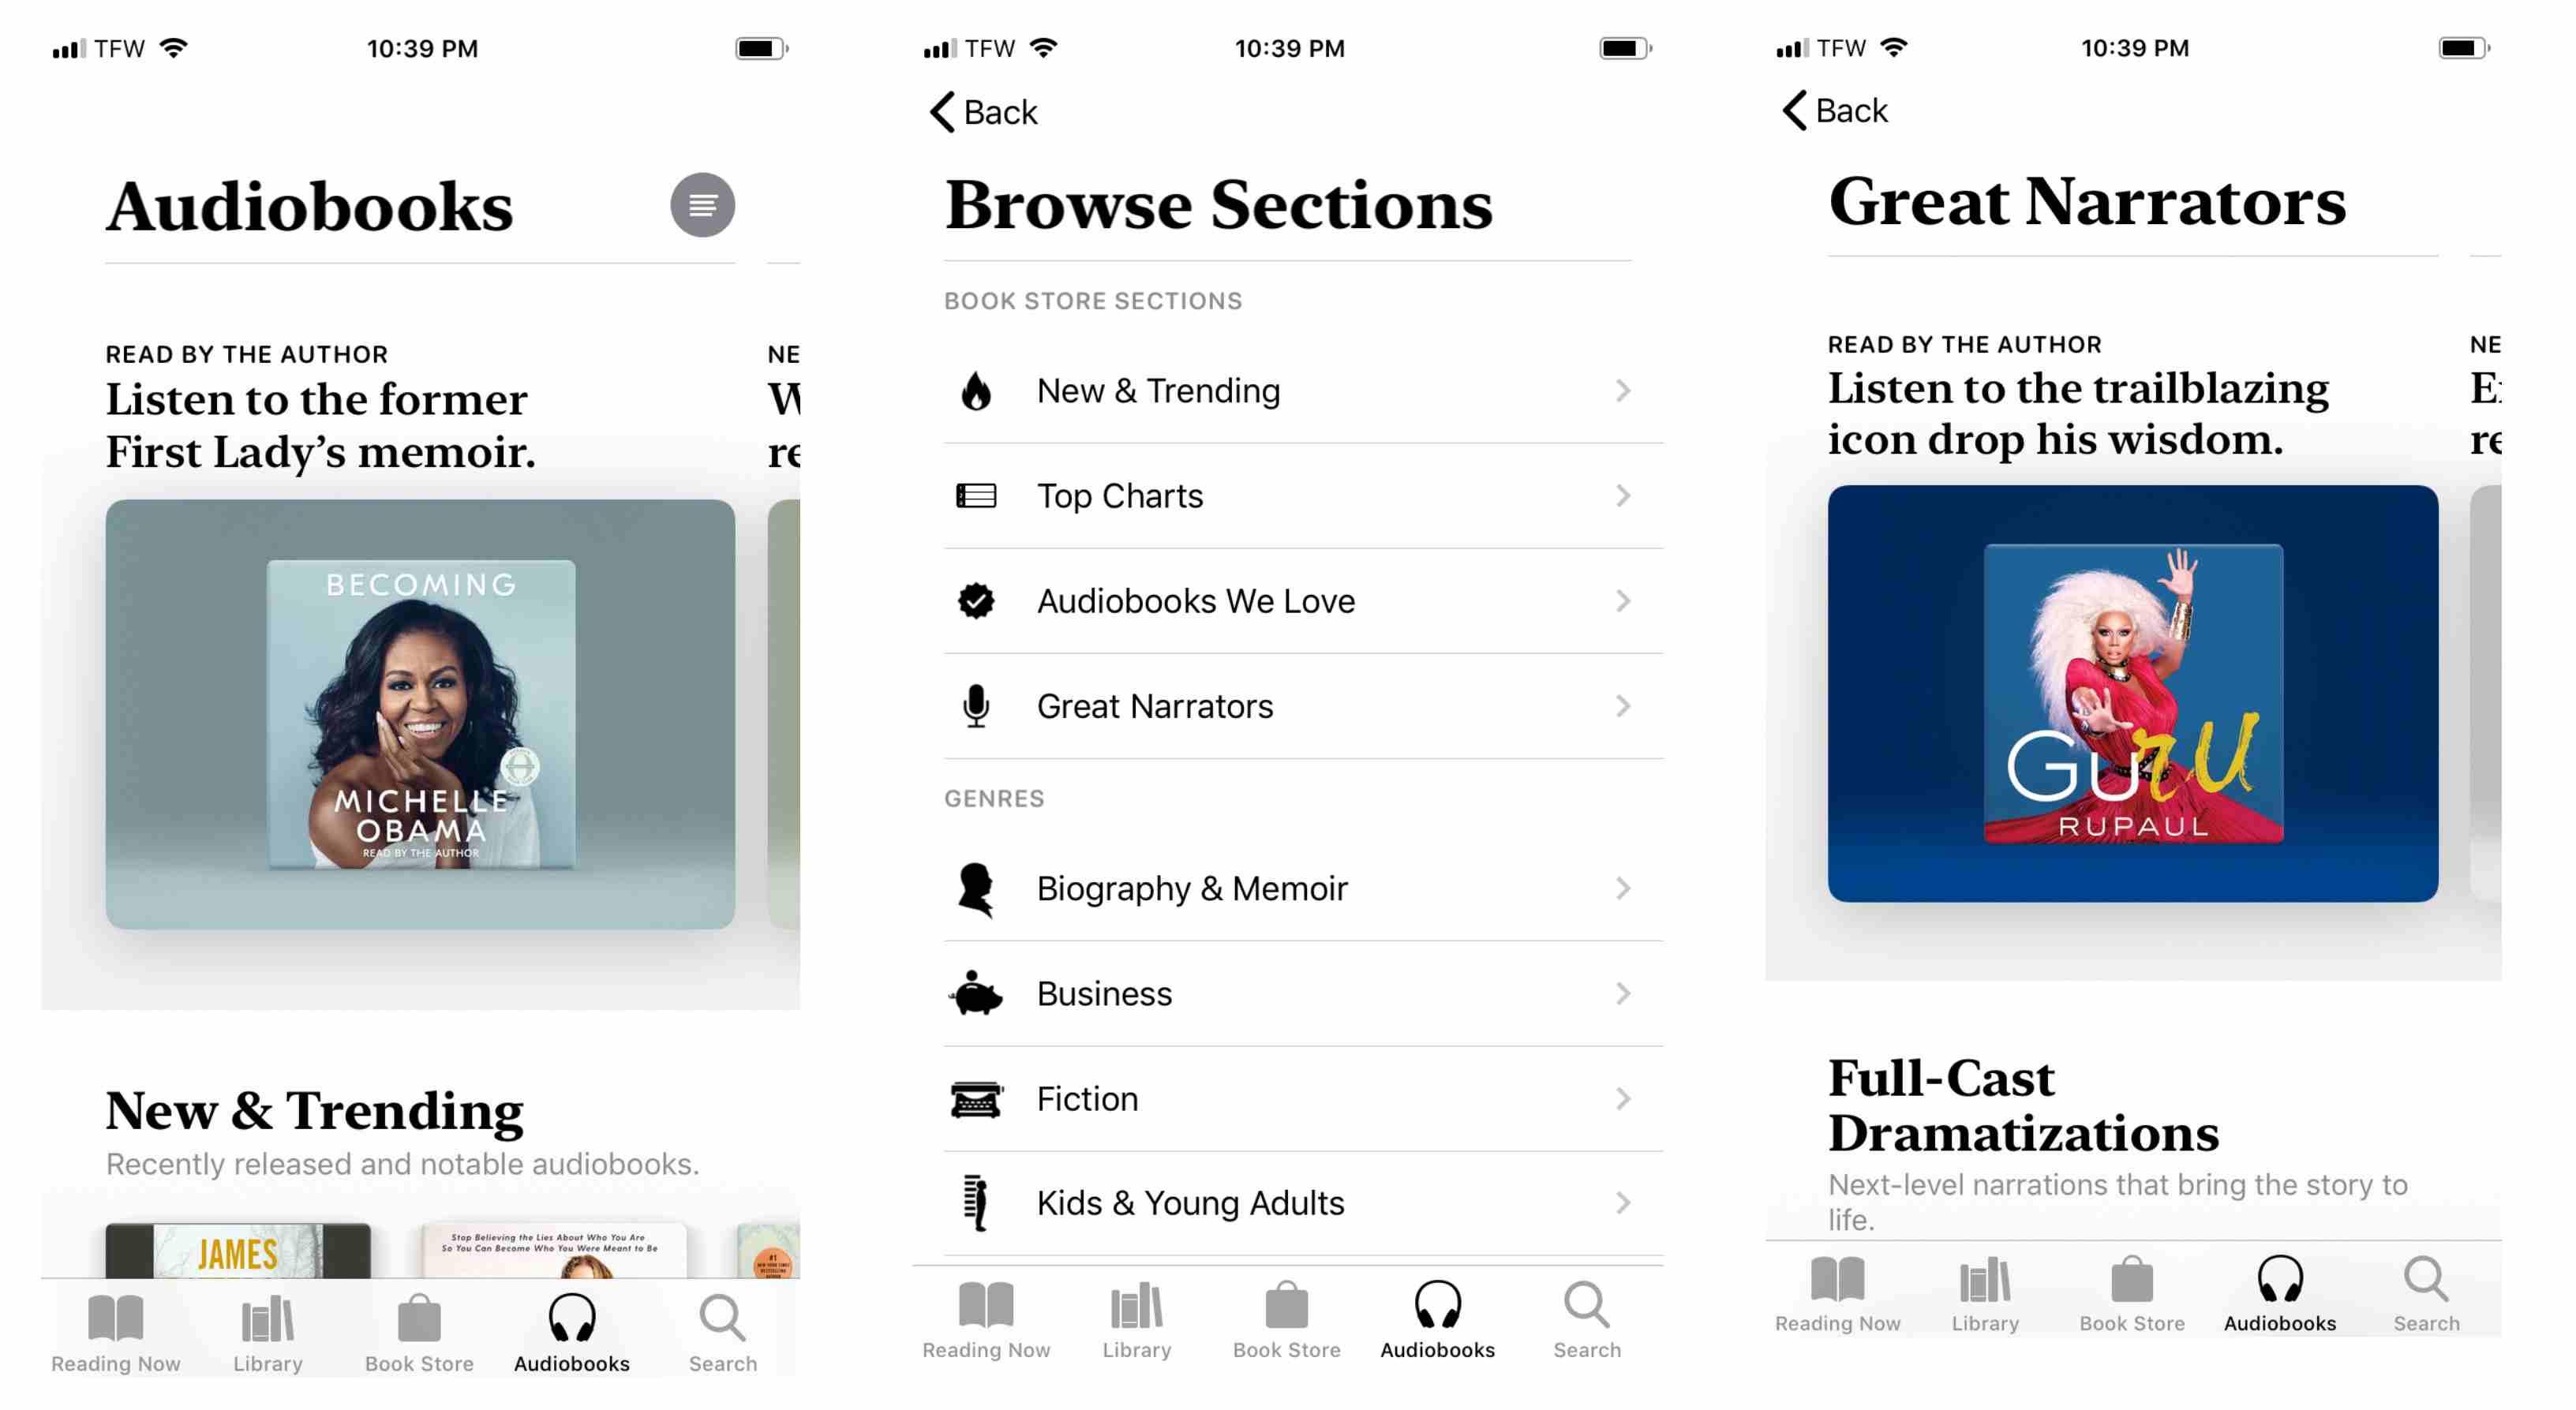 Screenshot of Apple Books Audiobooks screen on iPhone